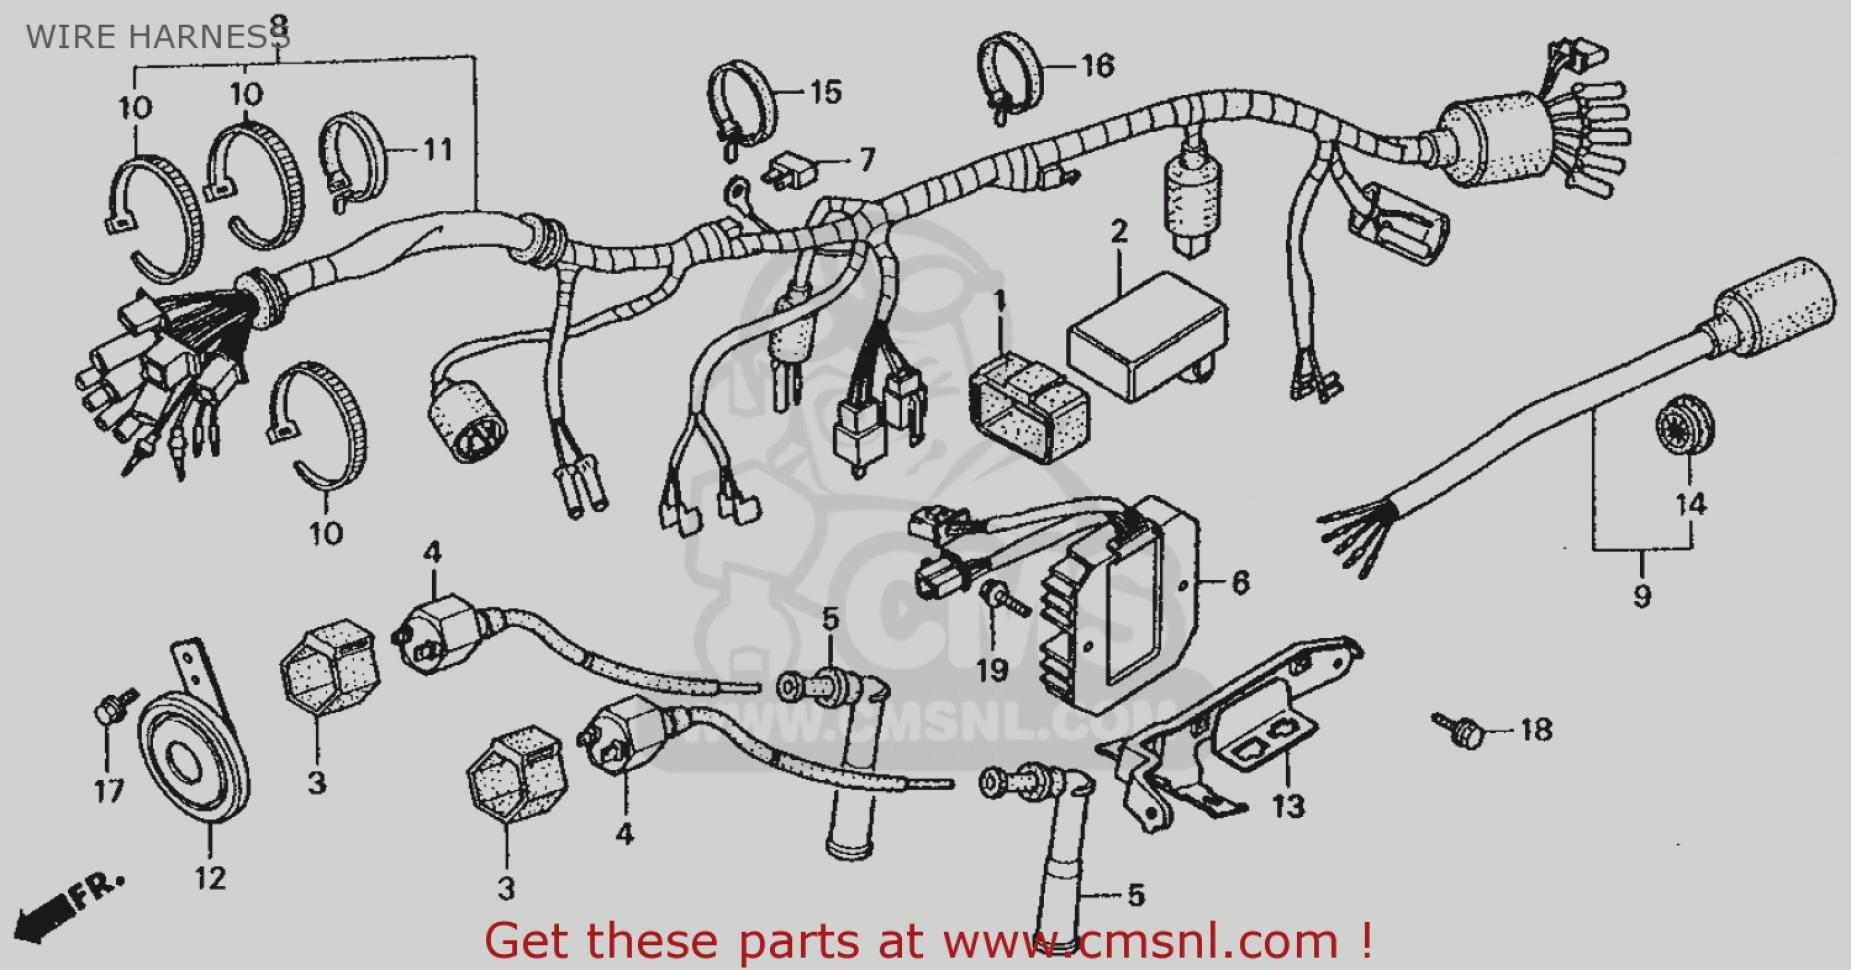 hight resolution of honda rebel 250 wiring diagram download wonderful honda cmx250c rebel 250 wiring diagram 1986 g download wiring diagram sheets detail name honda rebel